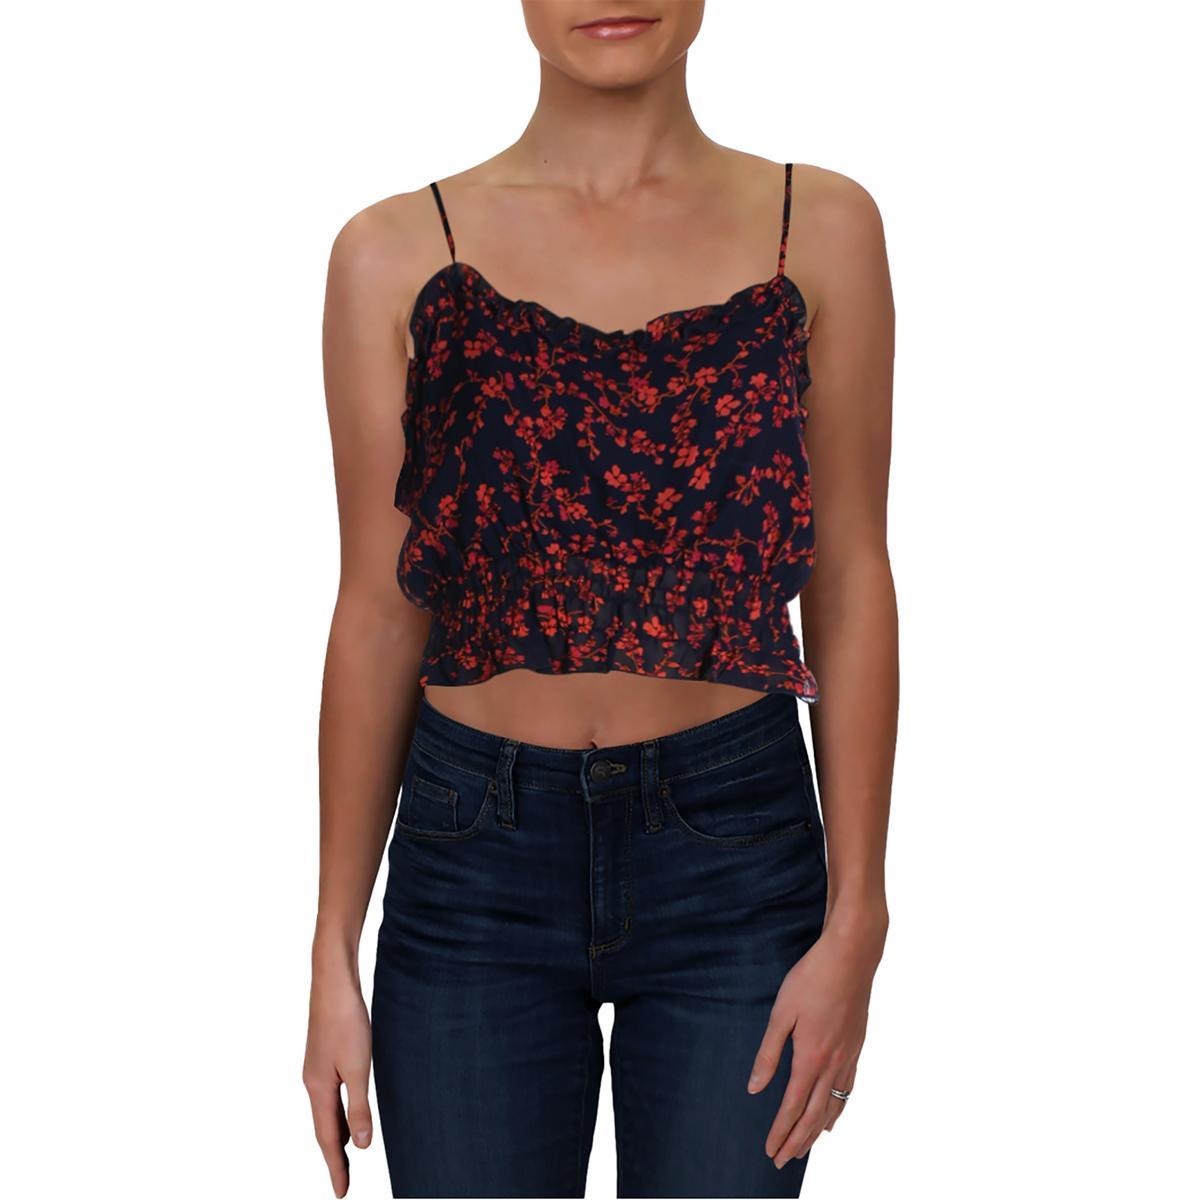 Aqua Womens Floral Print Smocked Ruffled Crop Top Shirt BHFO 6735